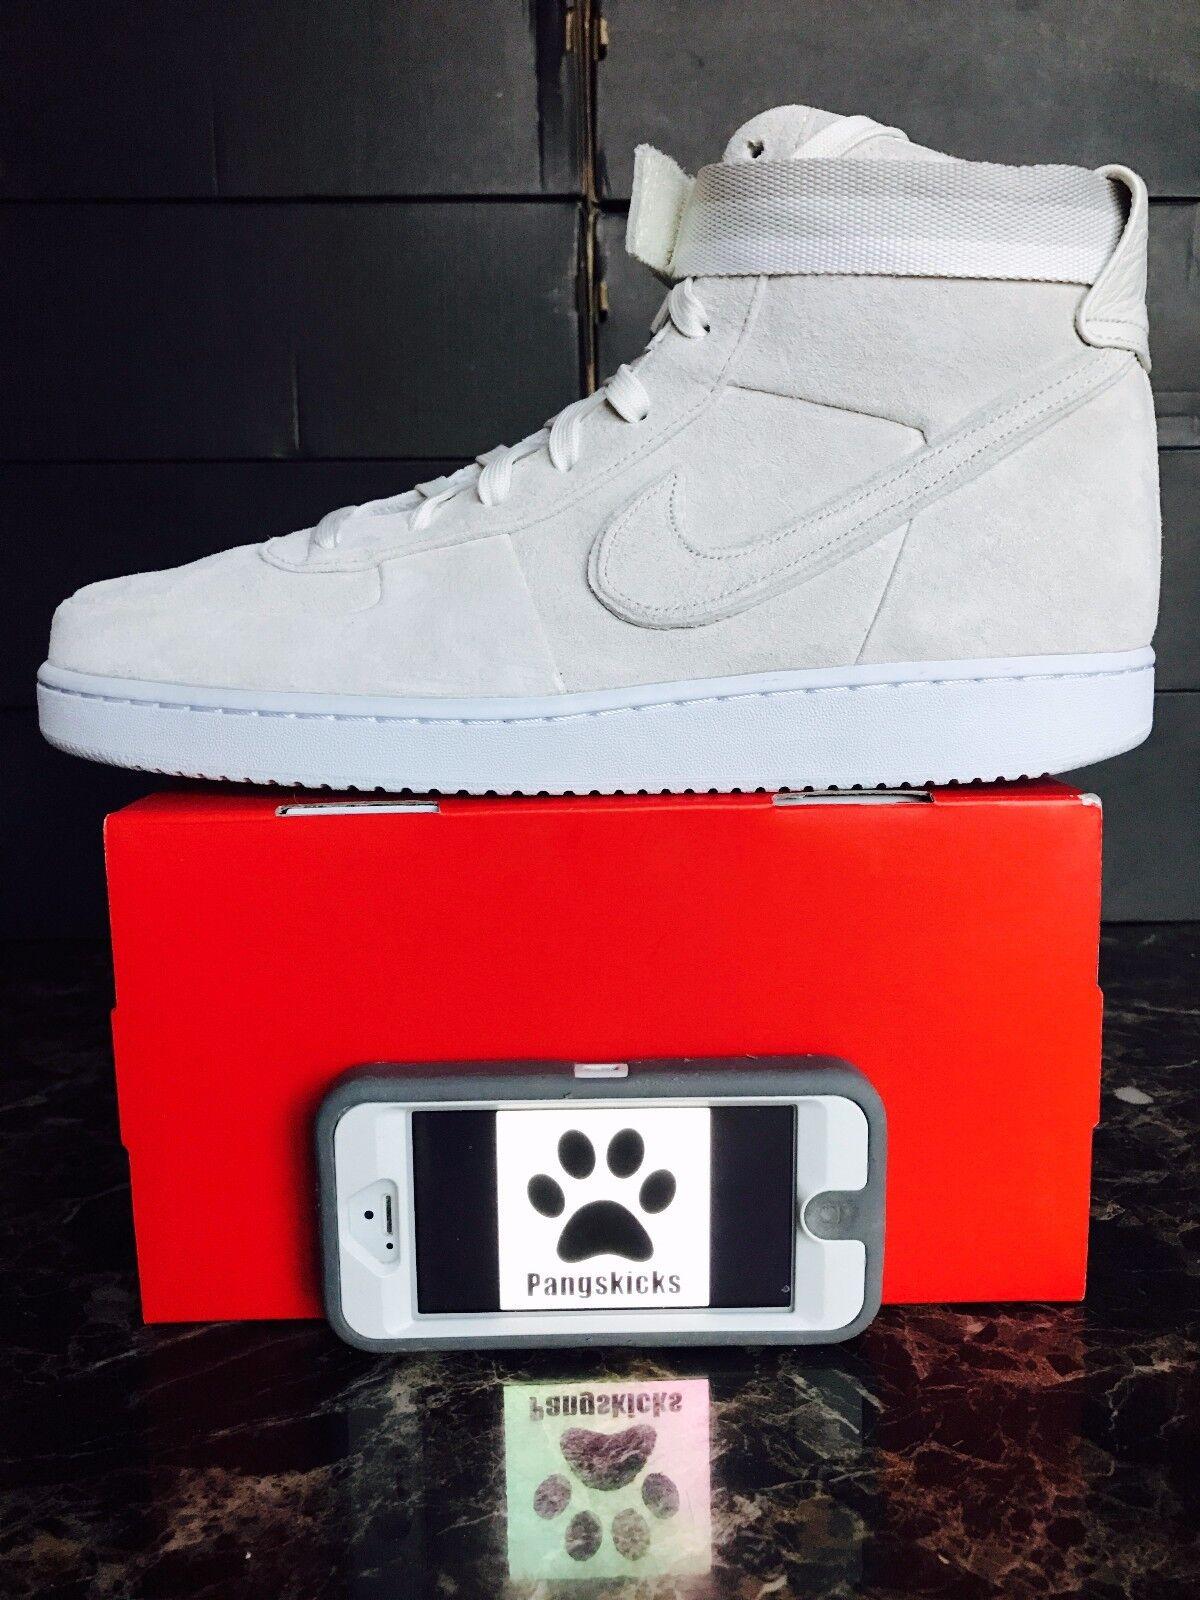 Nike Vandal High Premium John Elliott Sail White AH7171-101 Size 6-10